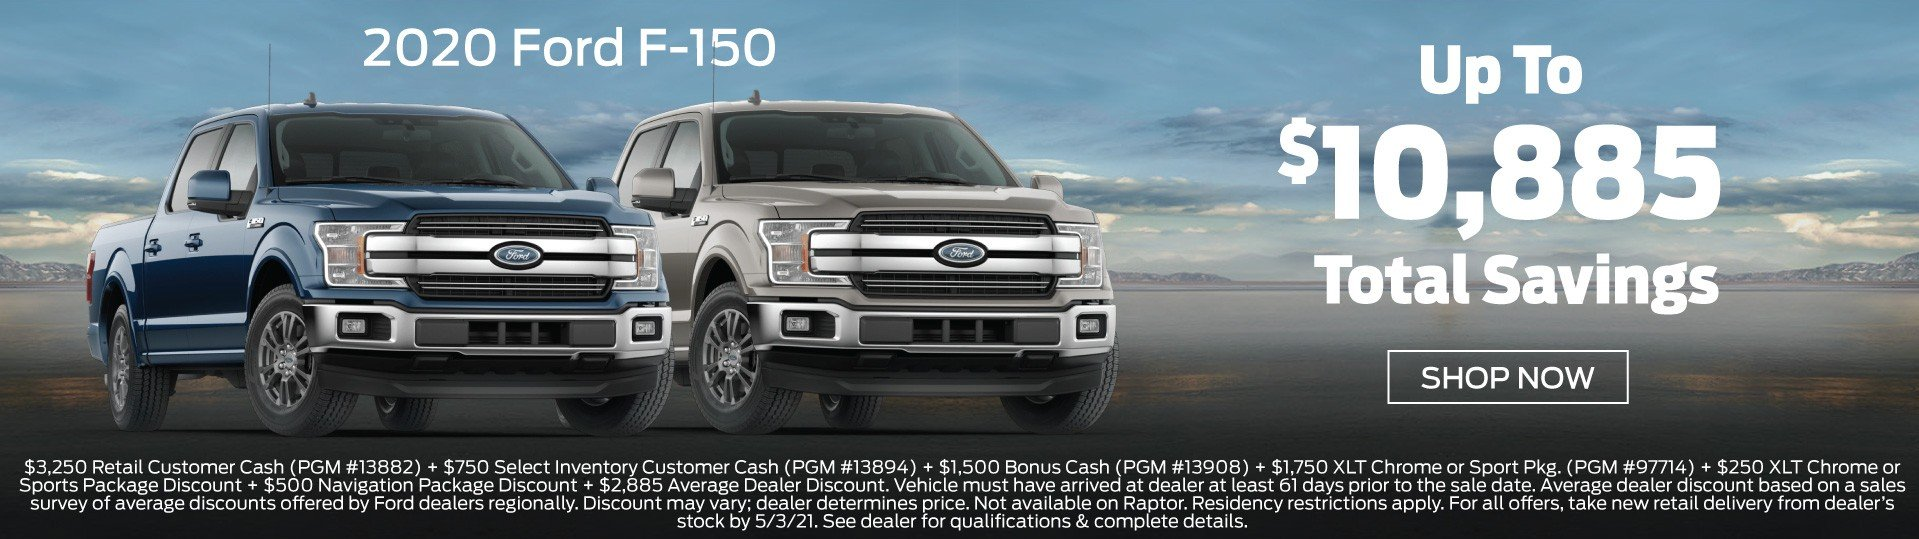 Ford F-150 Incentive 5-3-2021